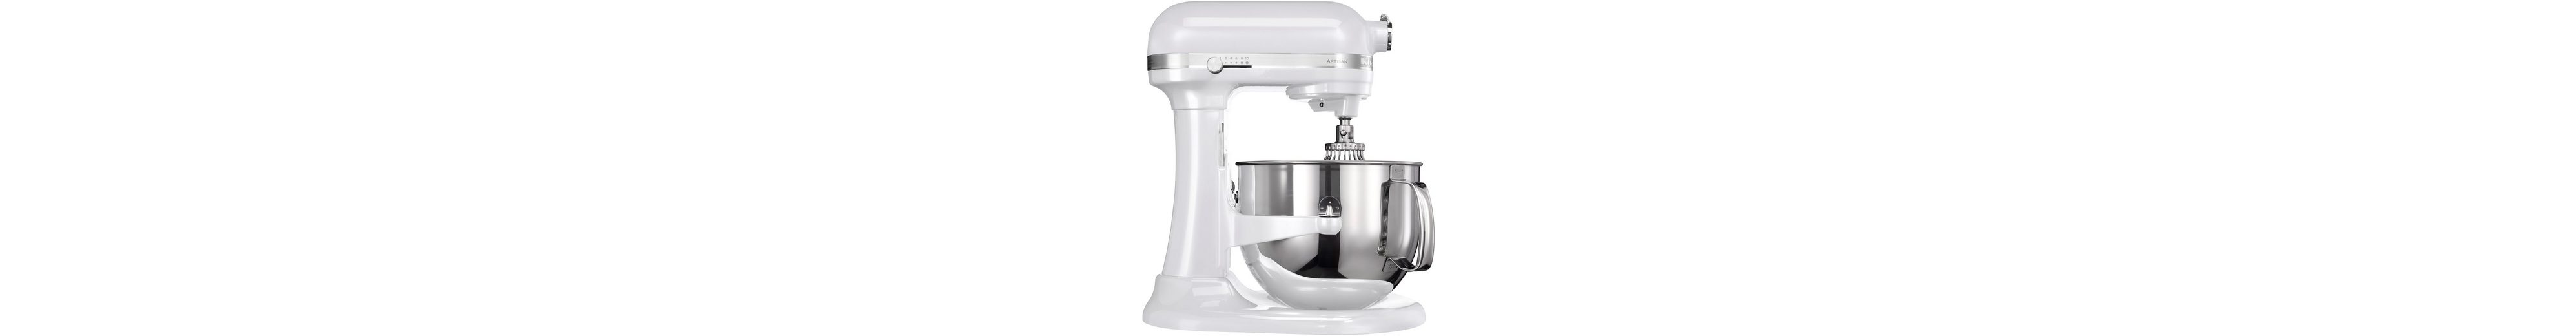 KitchenAid Küchenmaschine »Artisan frosted pearl 5KSM7580XEFP«